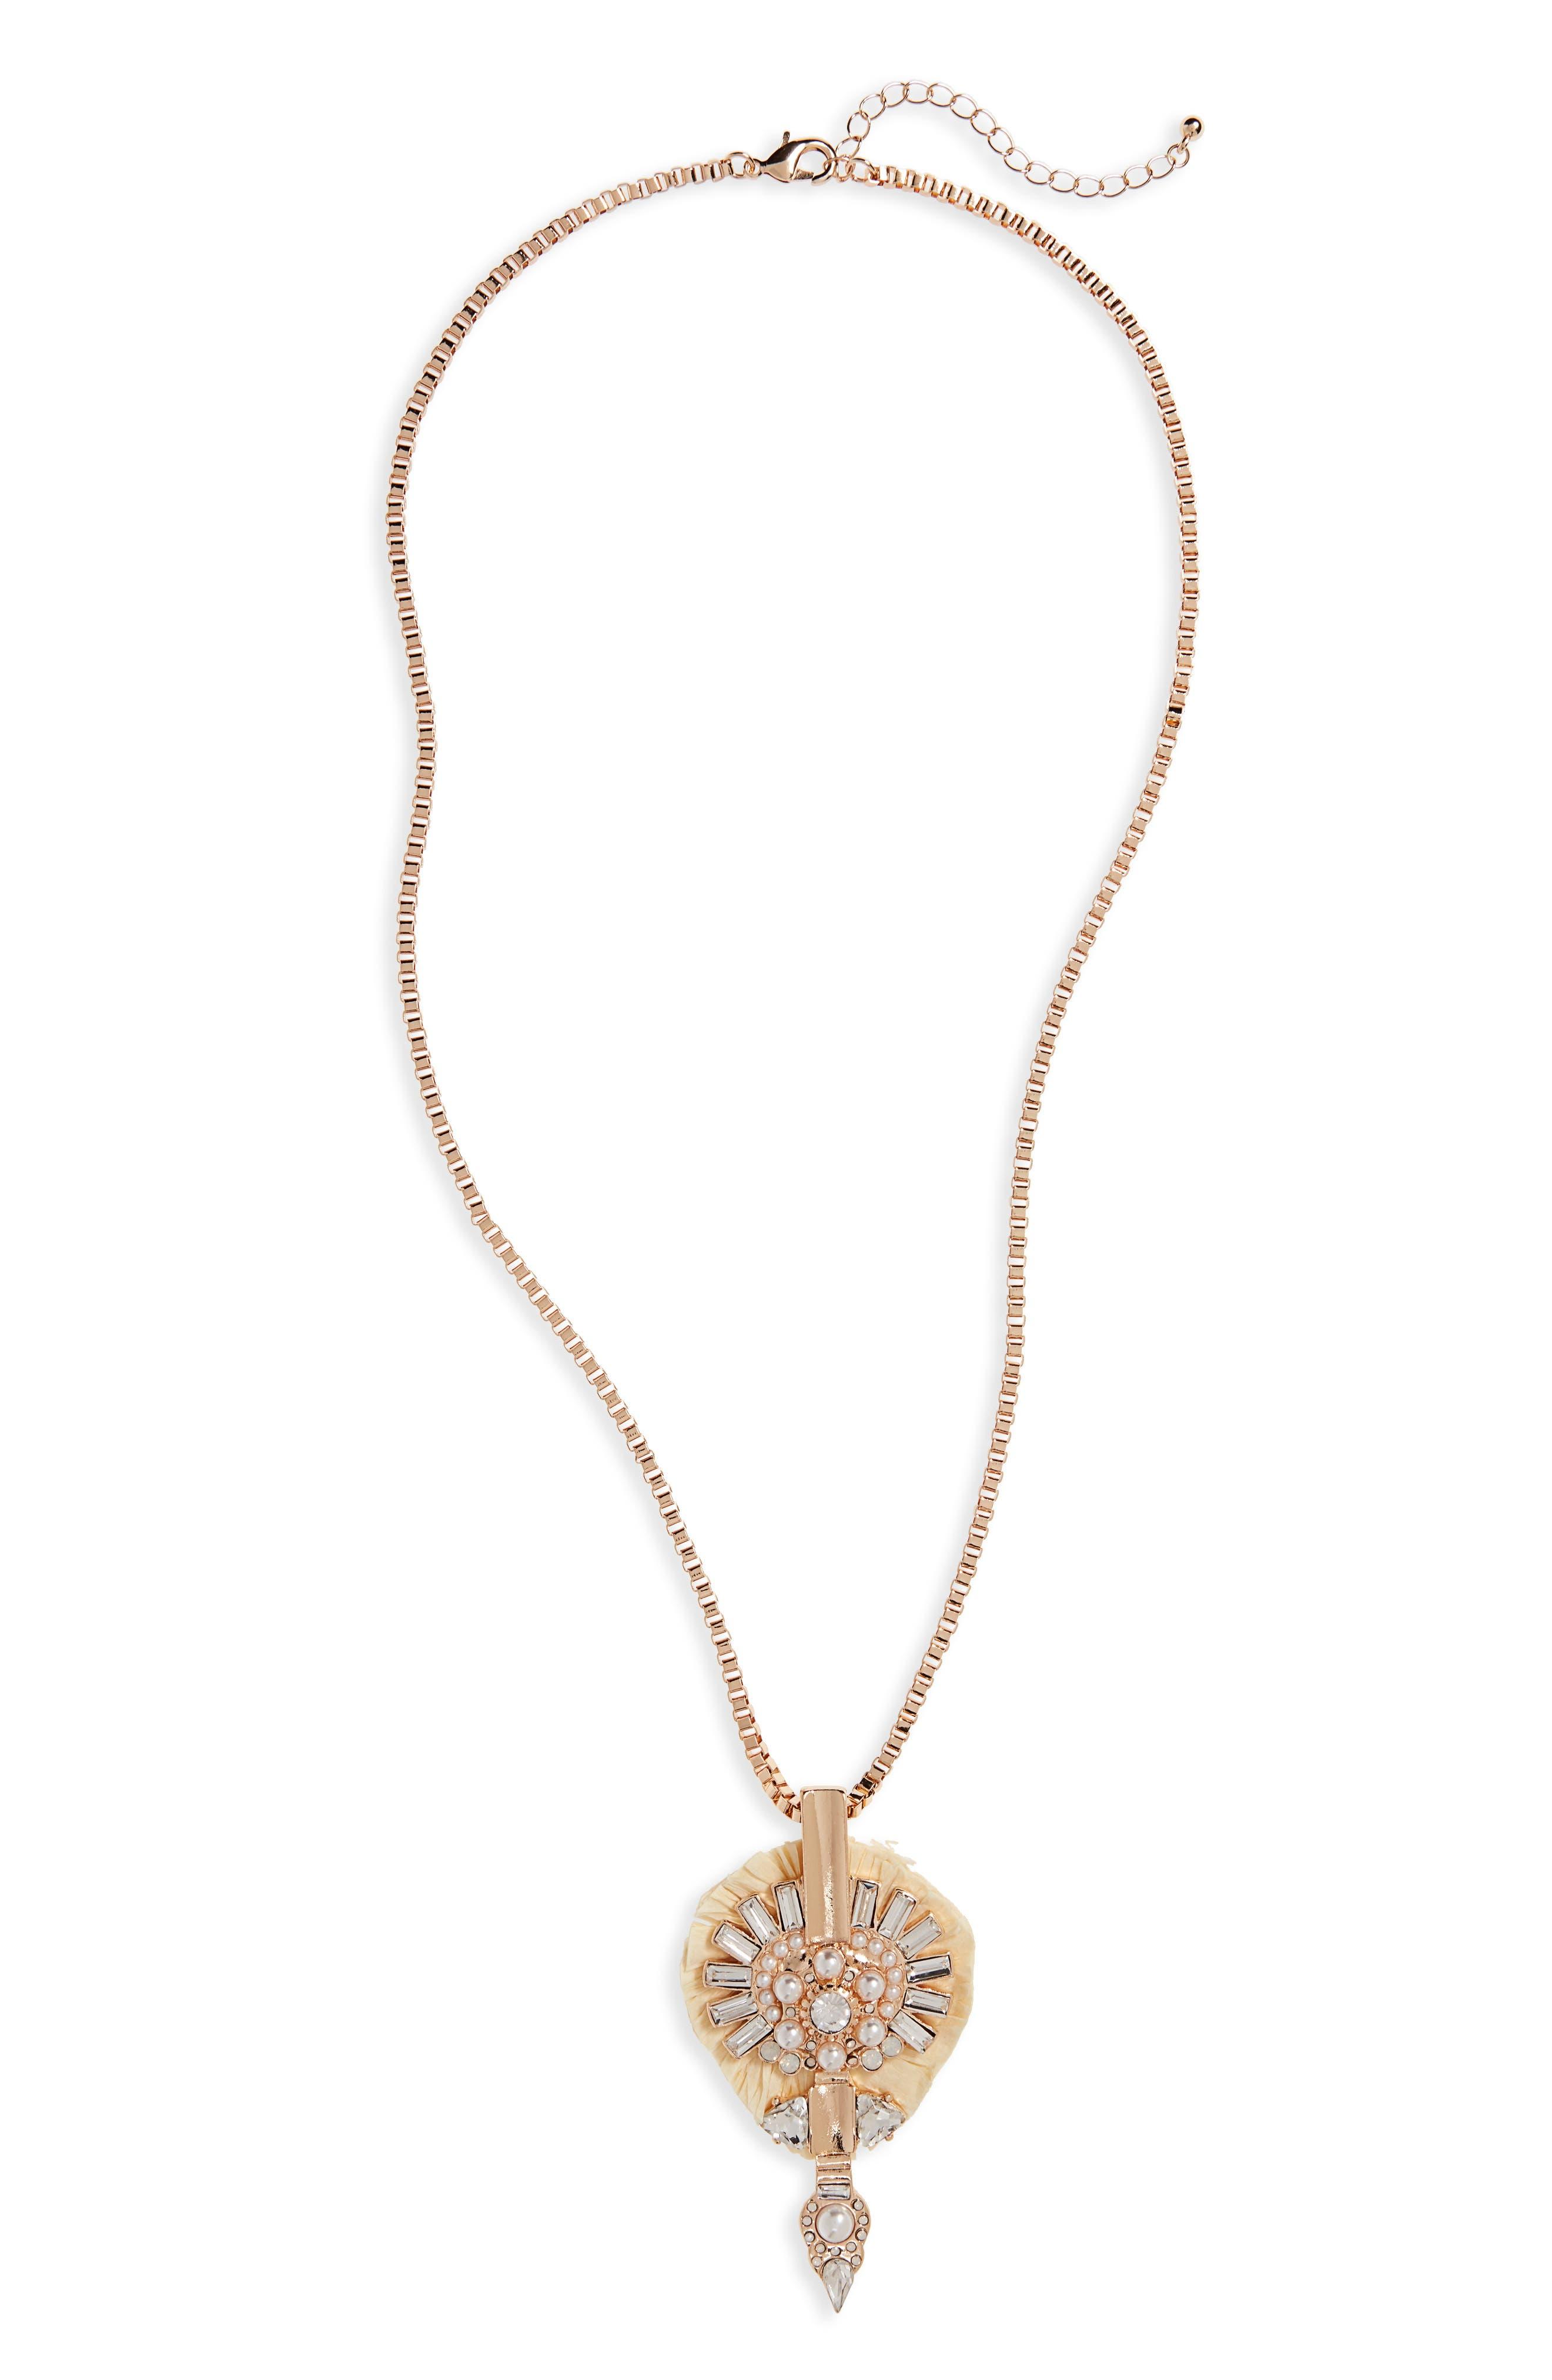 Brooch Pendant,                         Main,                         color, Gold/ Cream/ Pearl